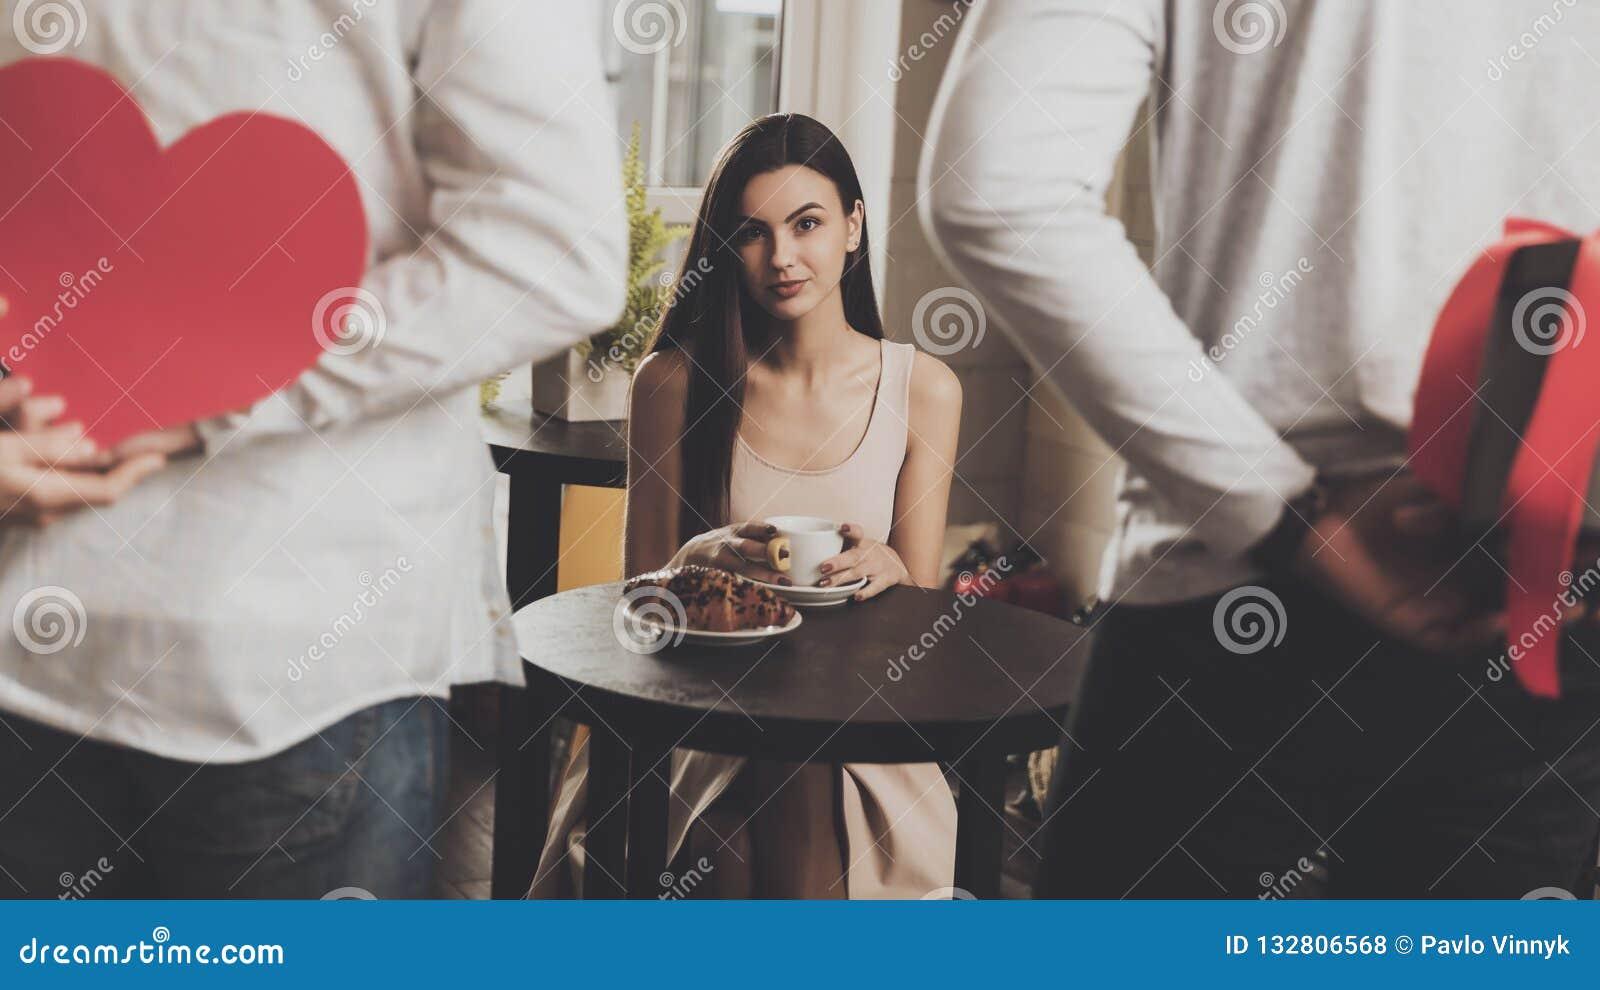 demi lovato dating nick jonas